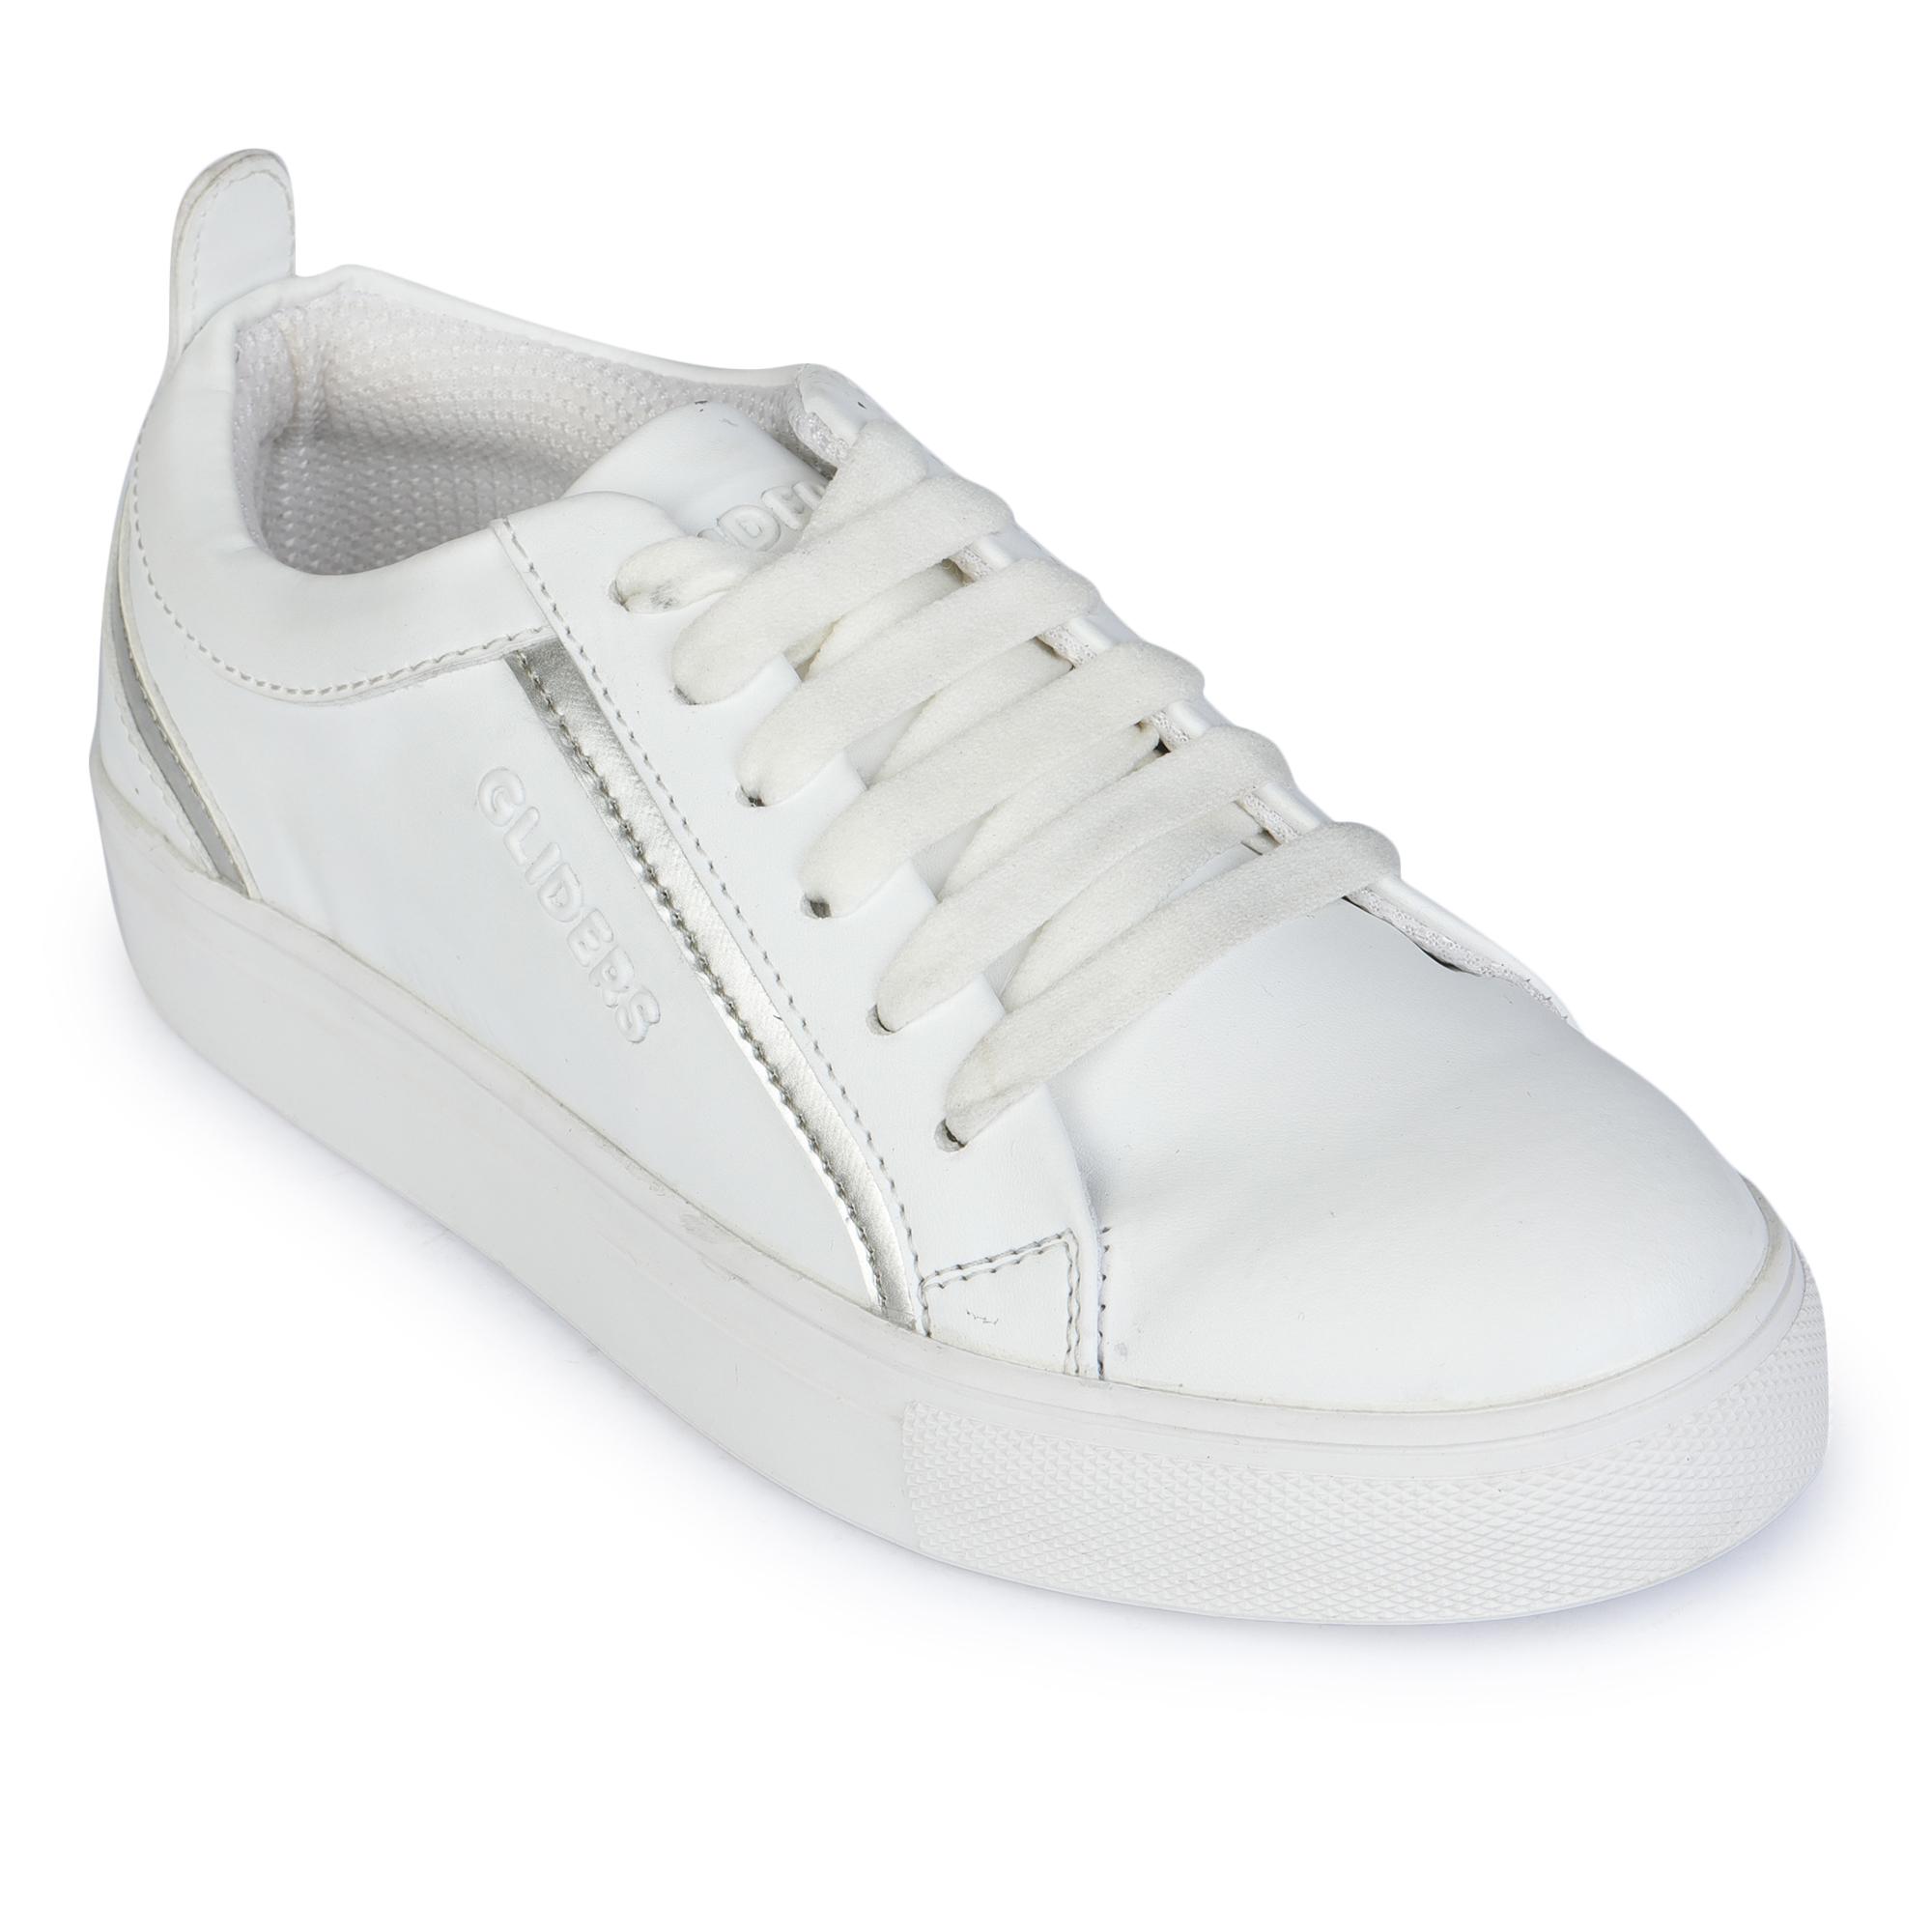 Liberty | Liberty Gliders White Sports Running Shoes WATKIN-1E_White For - Women